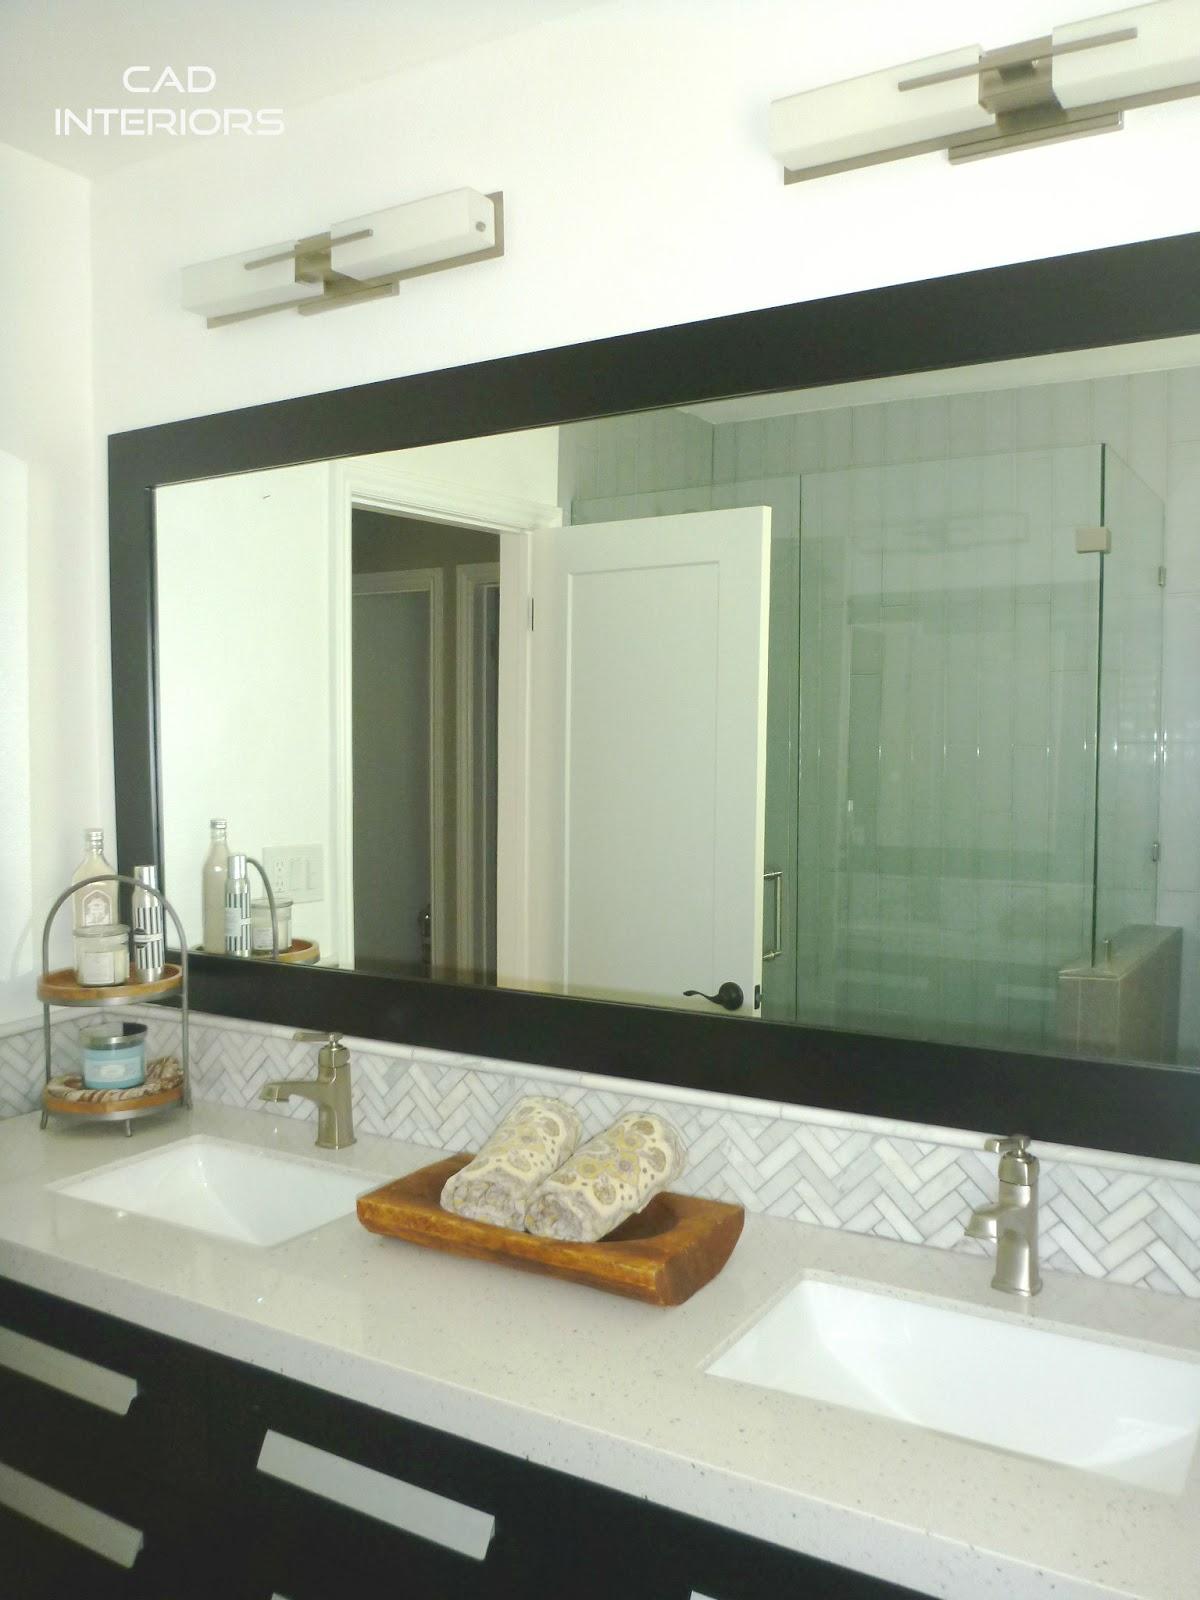 dual sinks 84 inch modern vanity all modern wayfair modern transitional interior design